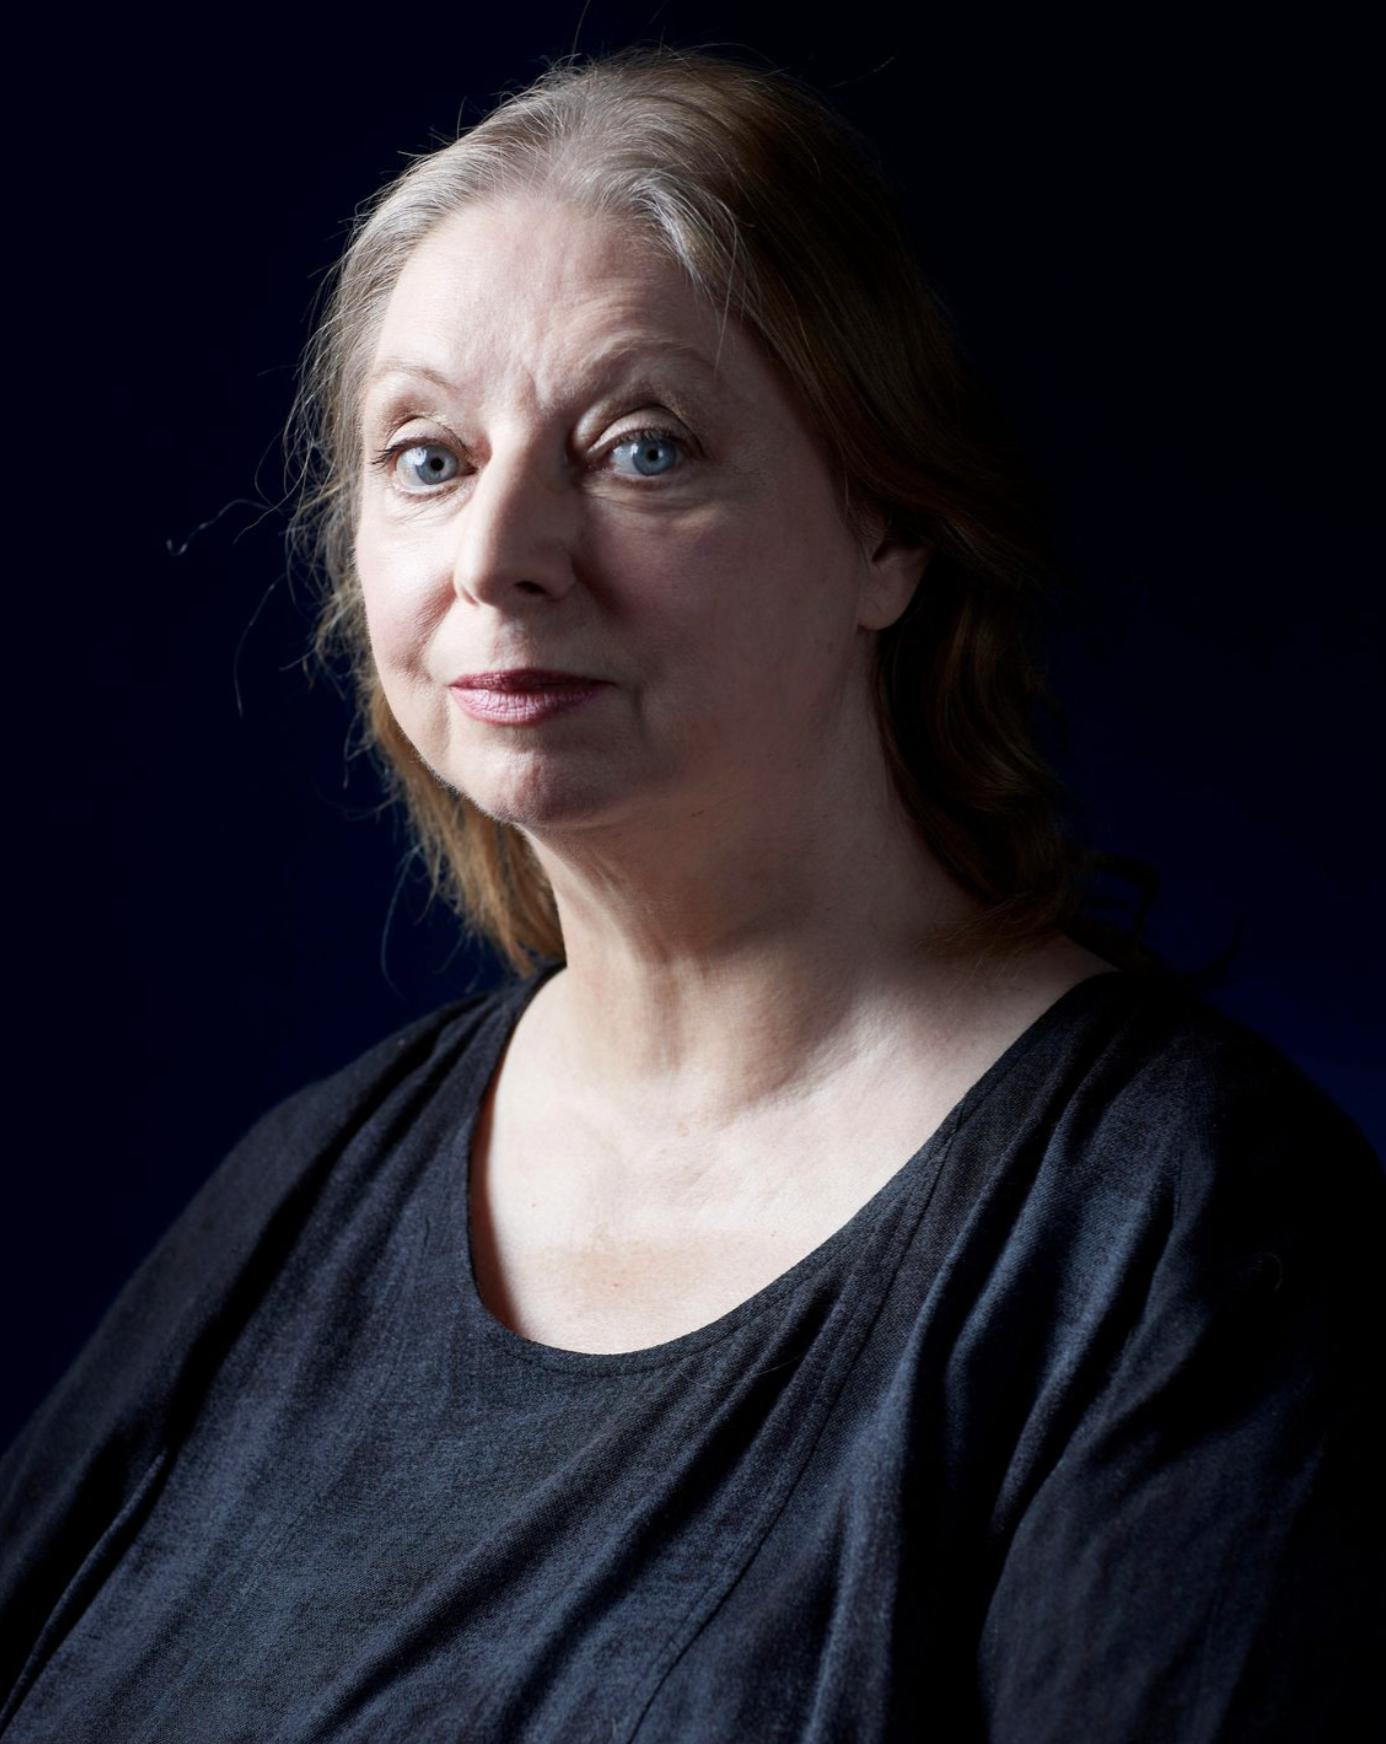 Hilary Mantel, photographed by David Levene